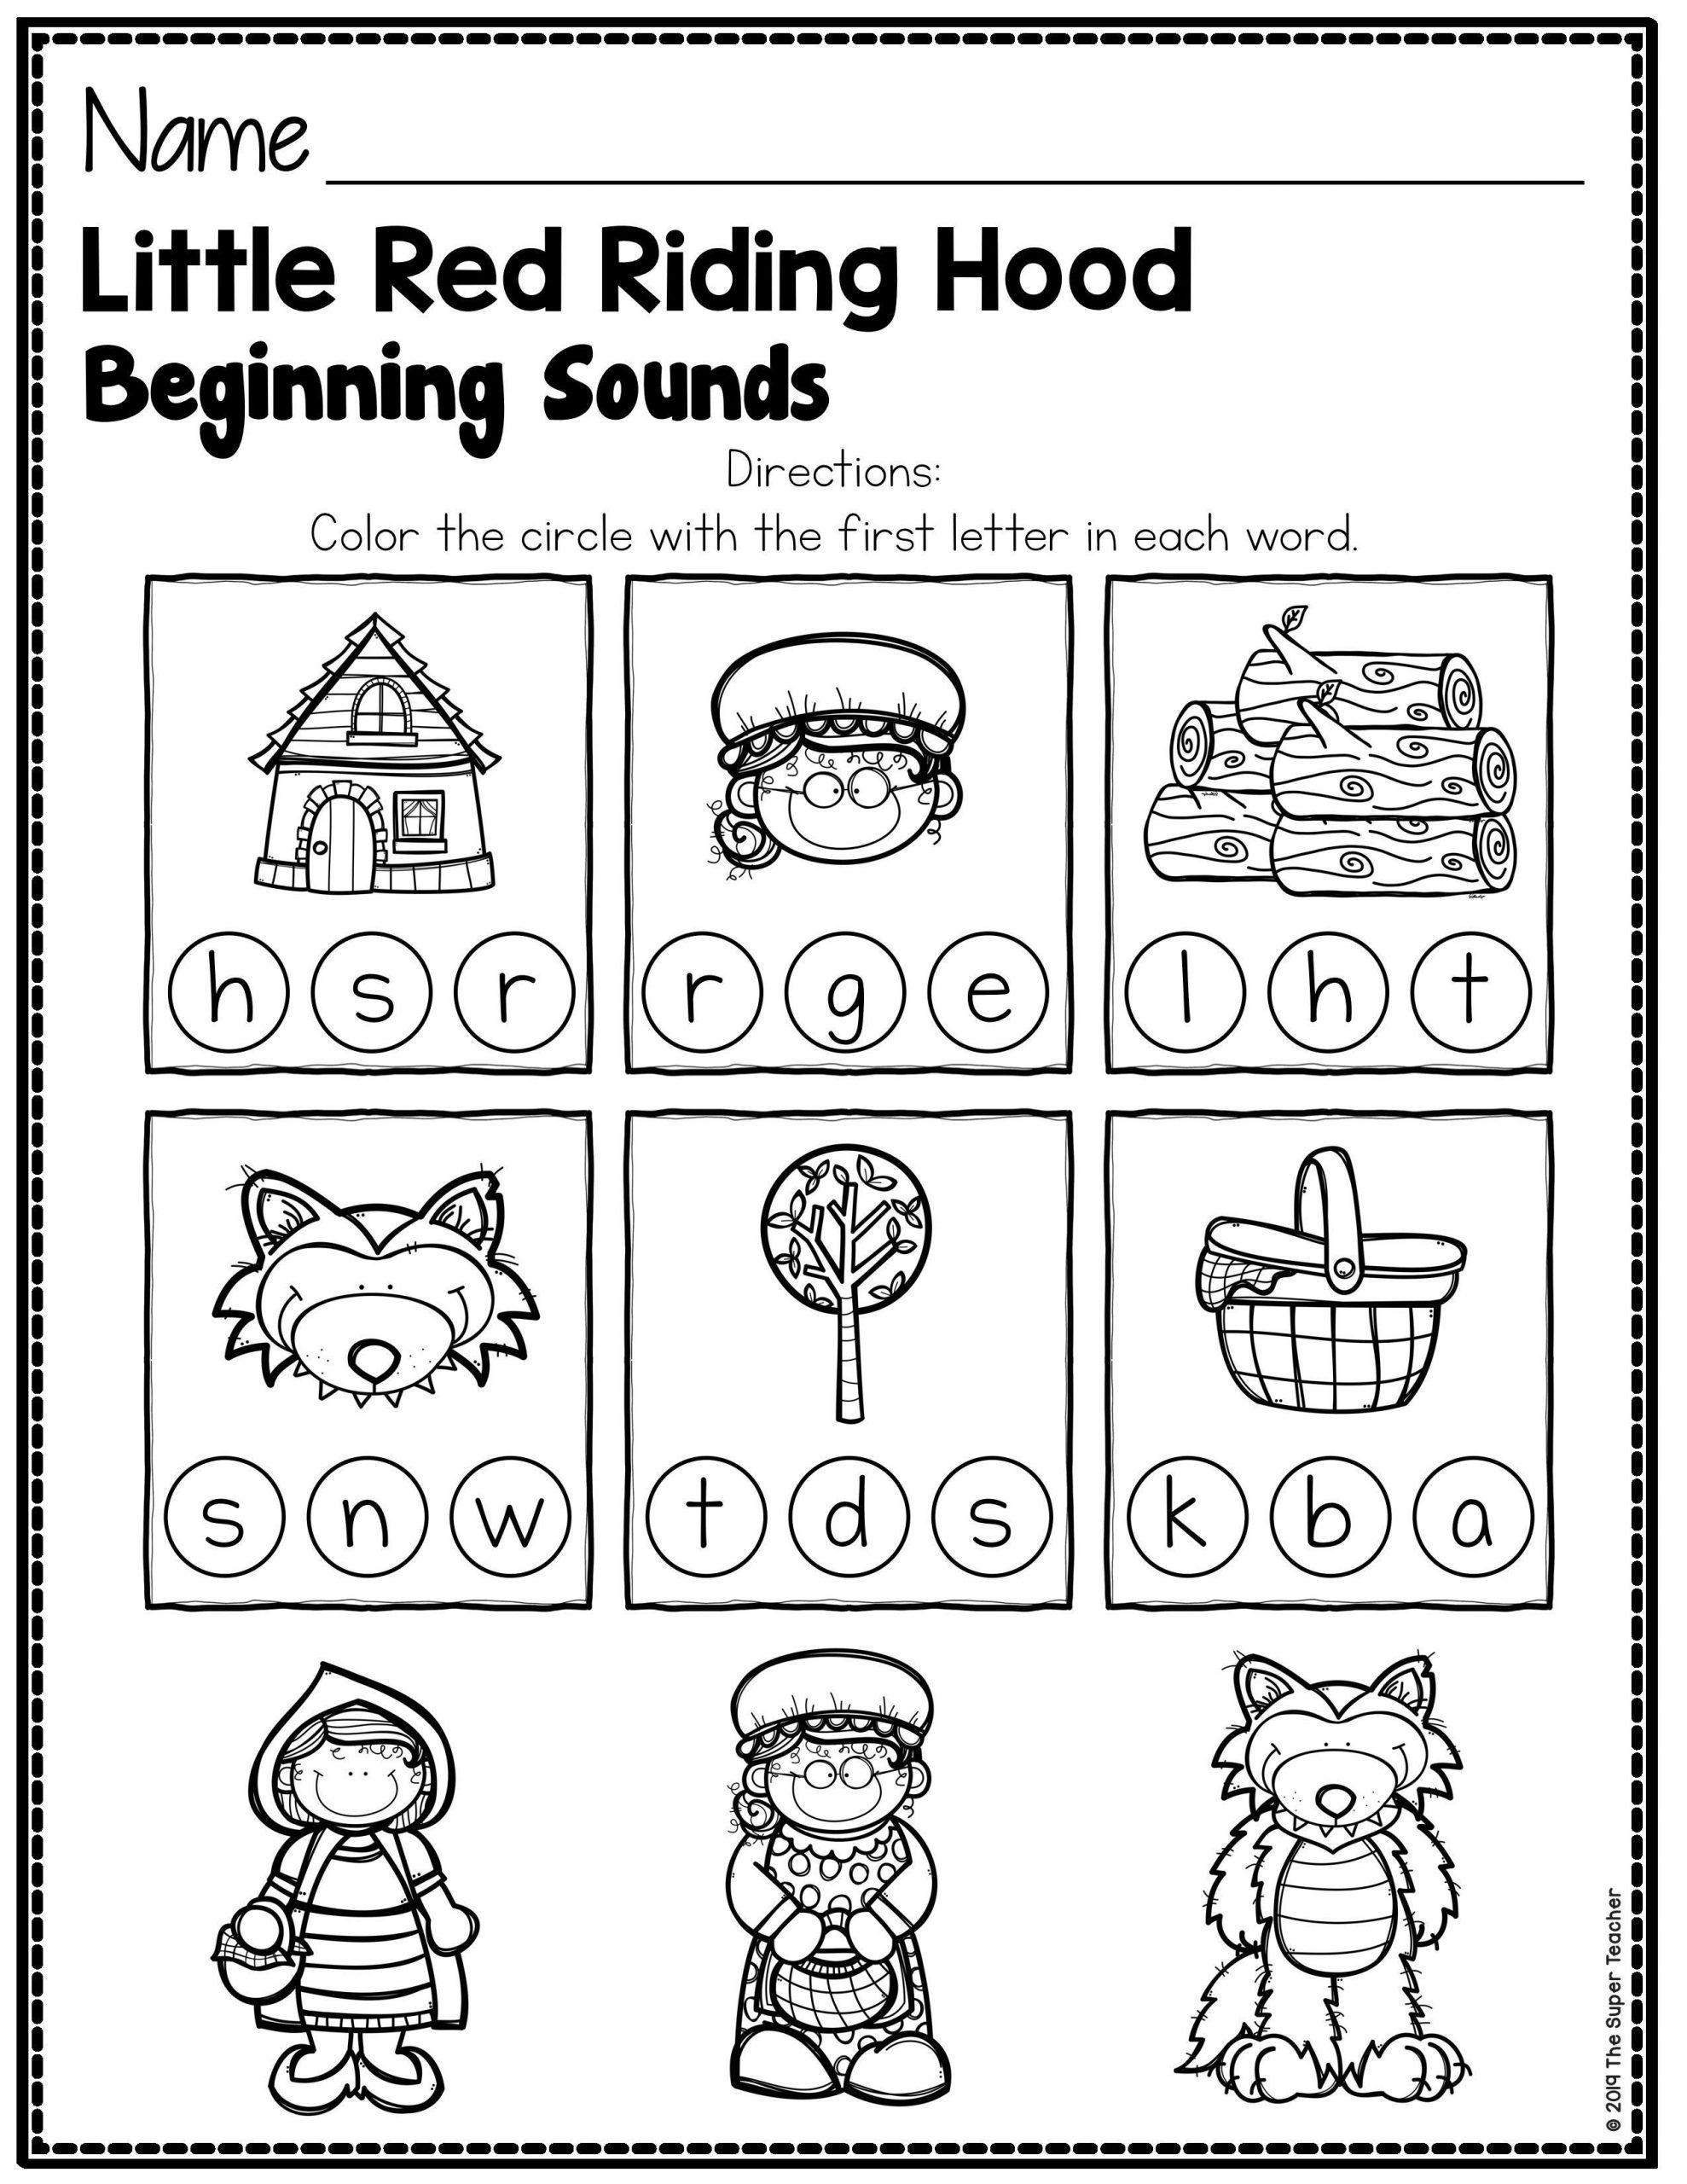 Kindergarten Story Retelling Worksheets Little Red Riding Hood Phonics Worksheets 1st Grade Worksheets [ 2560 x 1978 Pixel ]